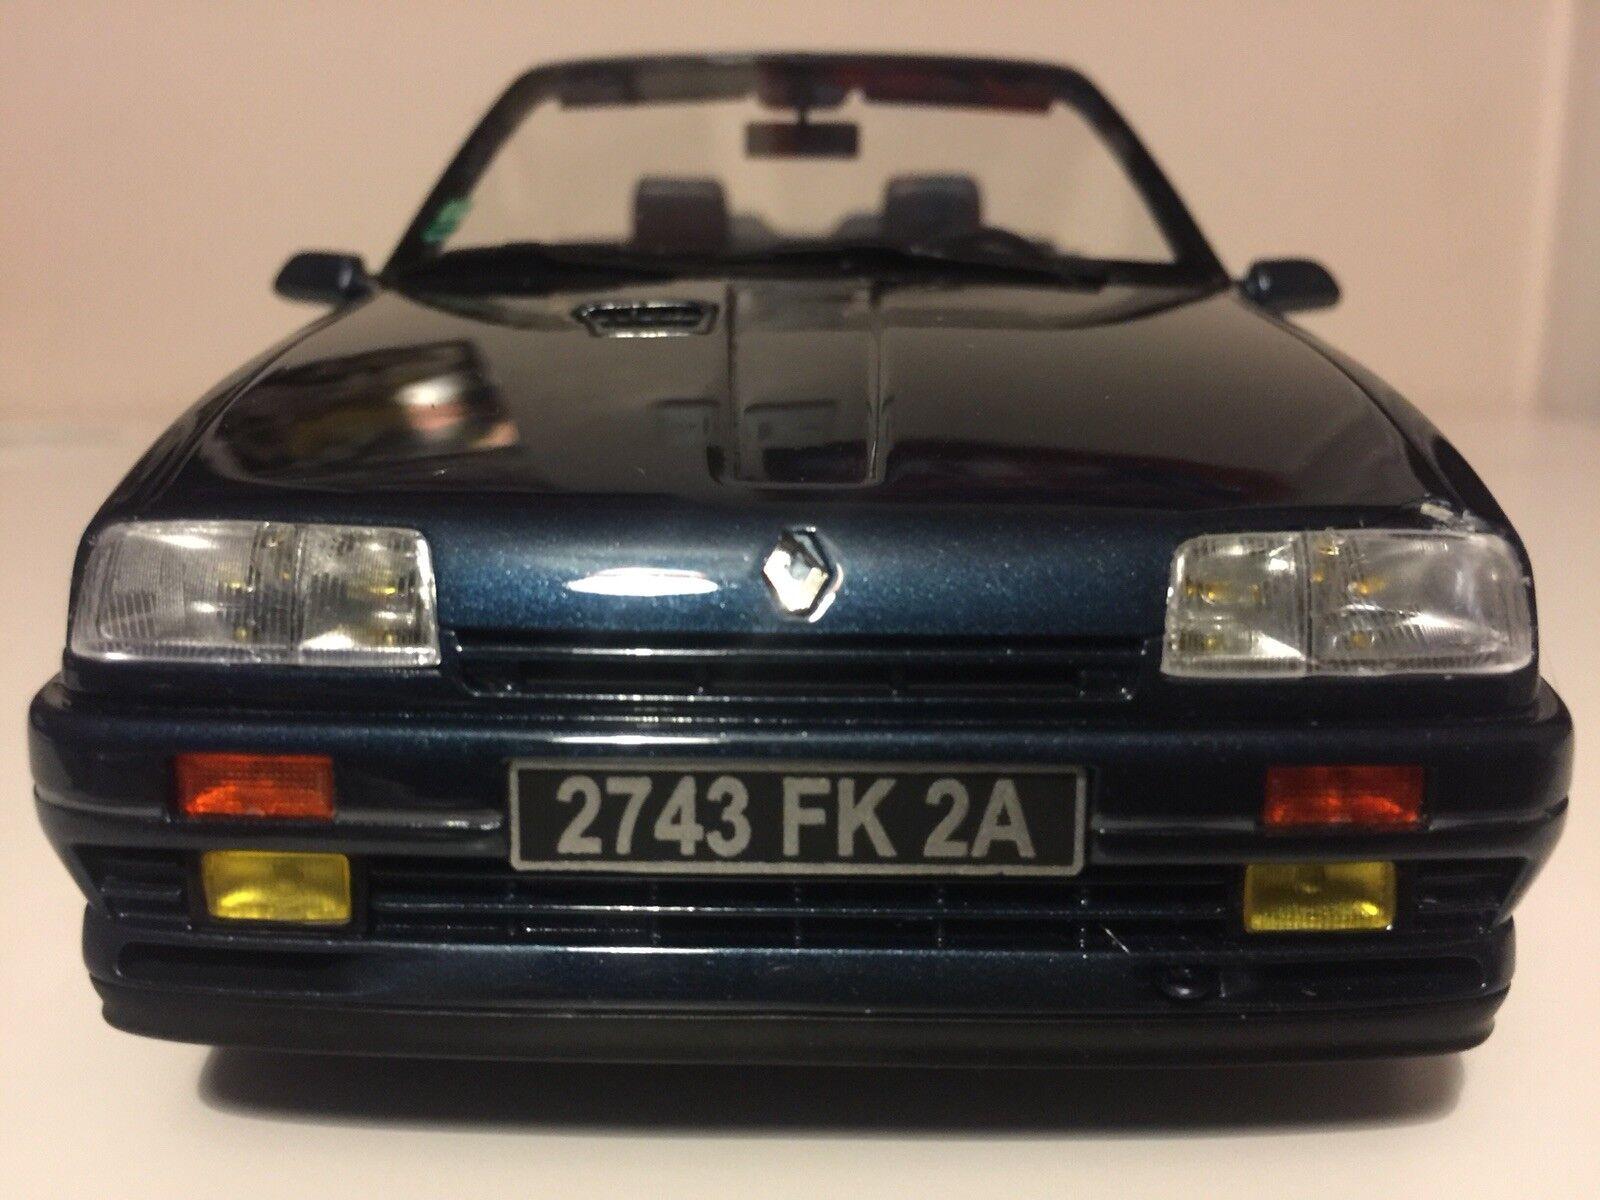 OTTO MOBILE RENAULT 19 16S CABRIOLET model car dark bluee Ltd Ed 1 18